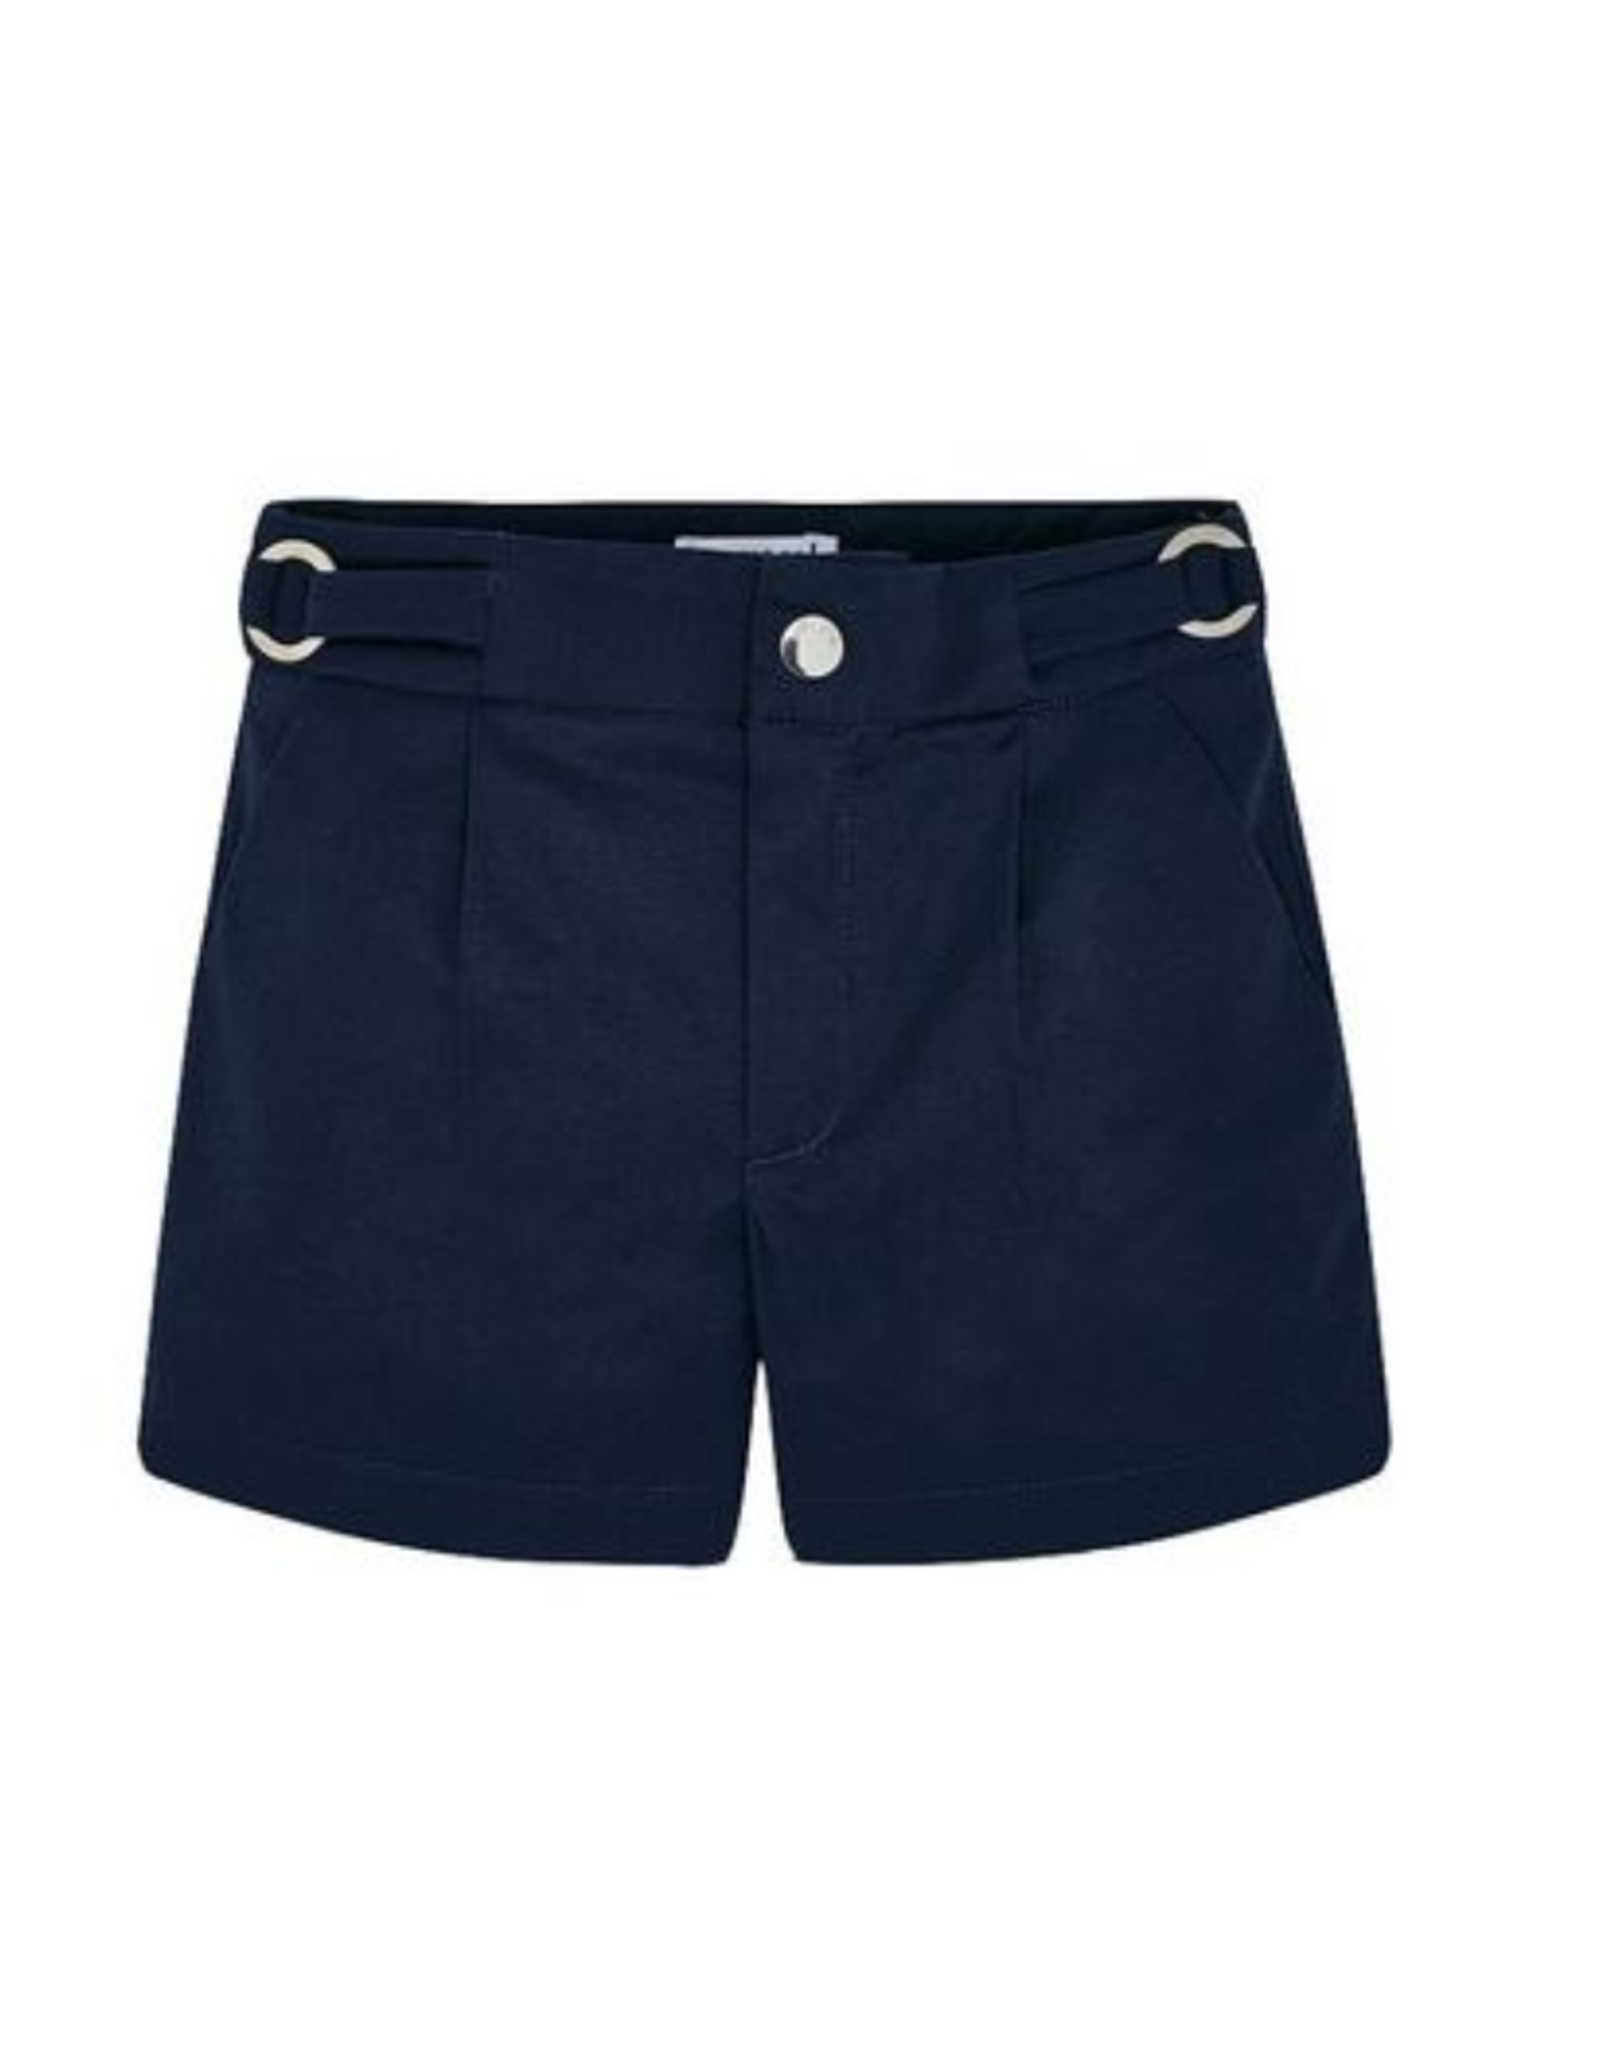 Mayoral Navy Satin Shorts